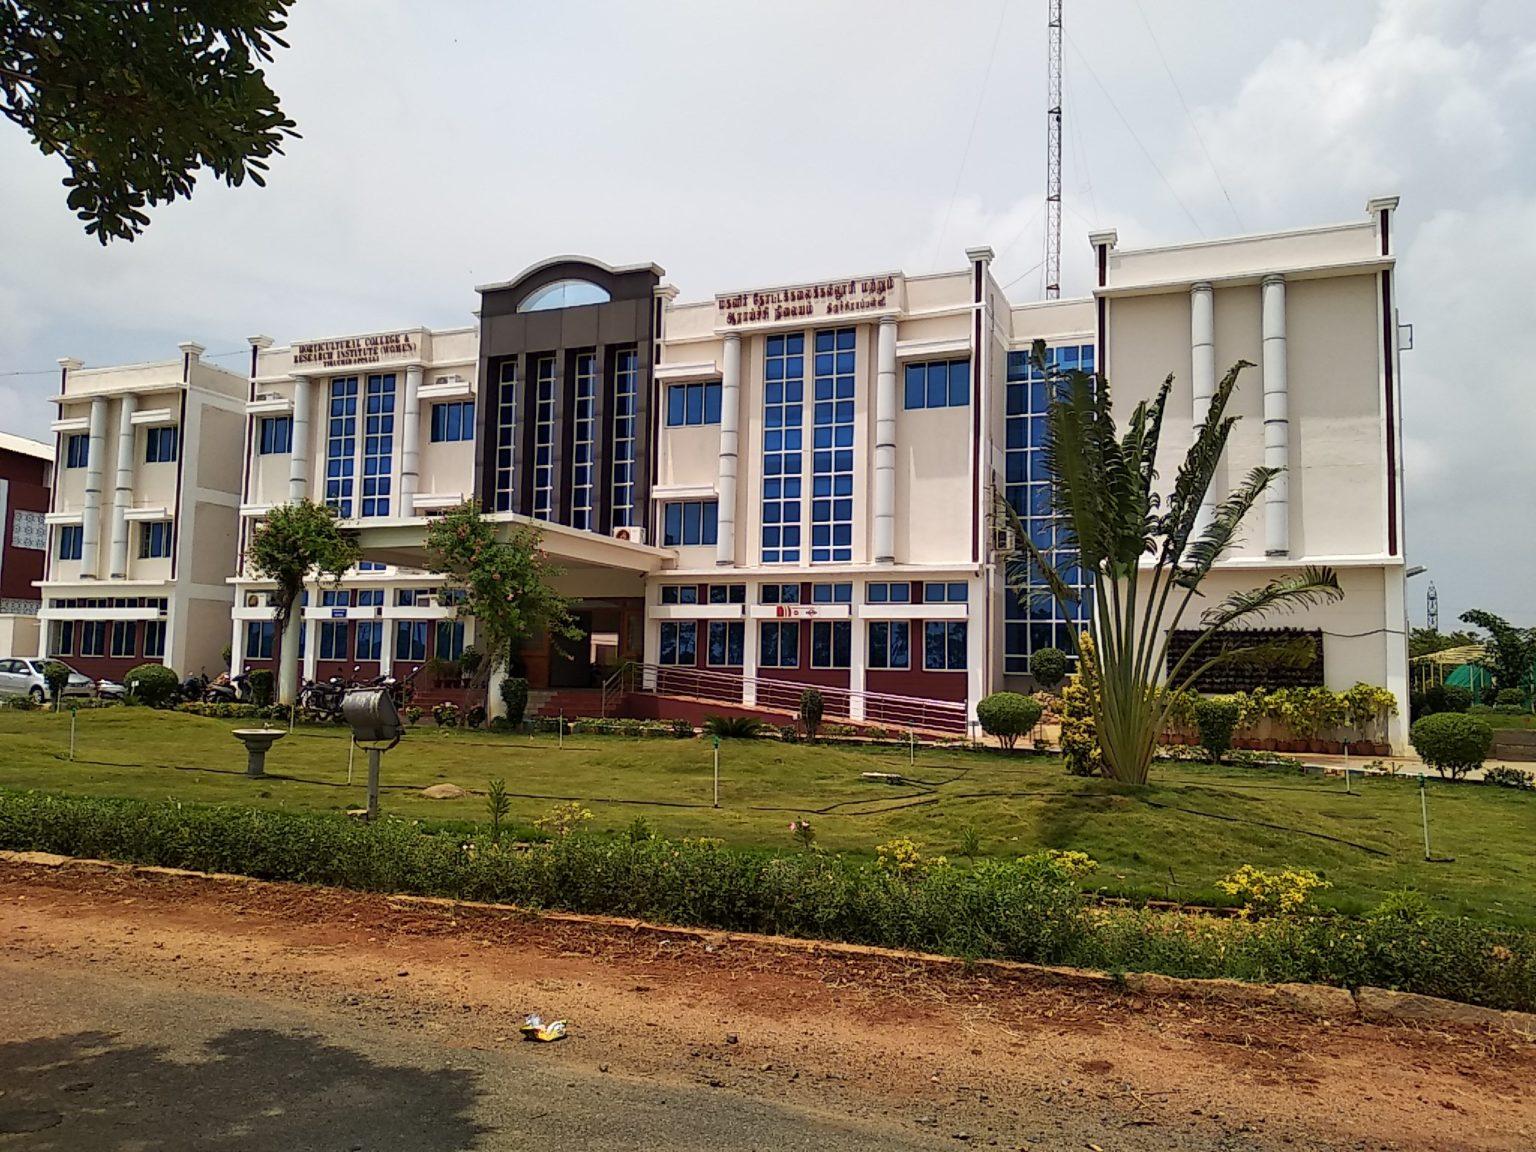 Horticultural College and Research Institute for Women, Tiruchirappalli